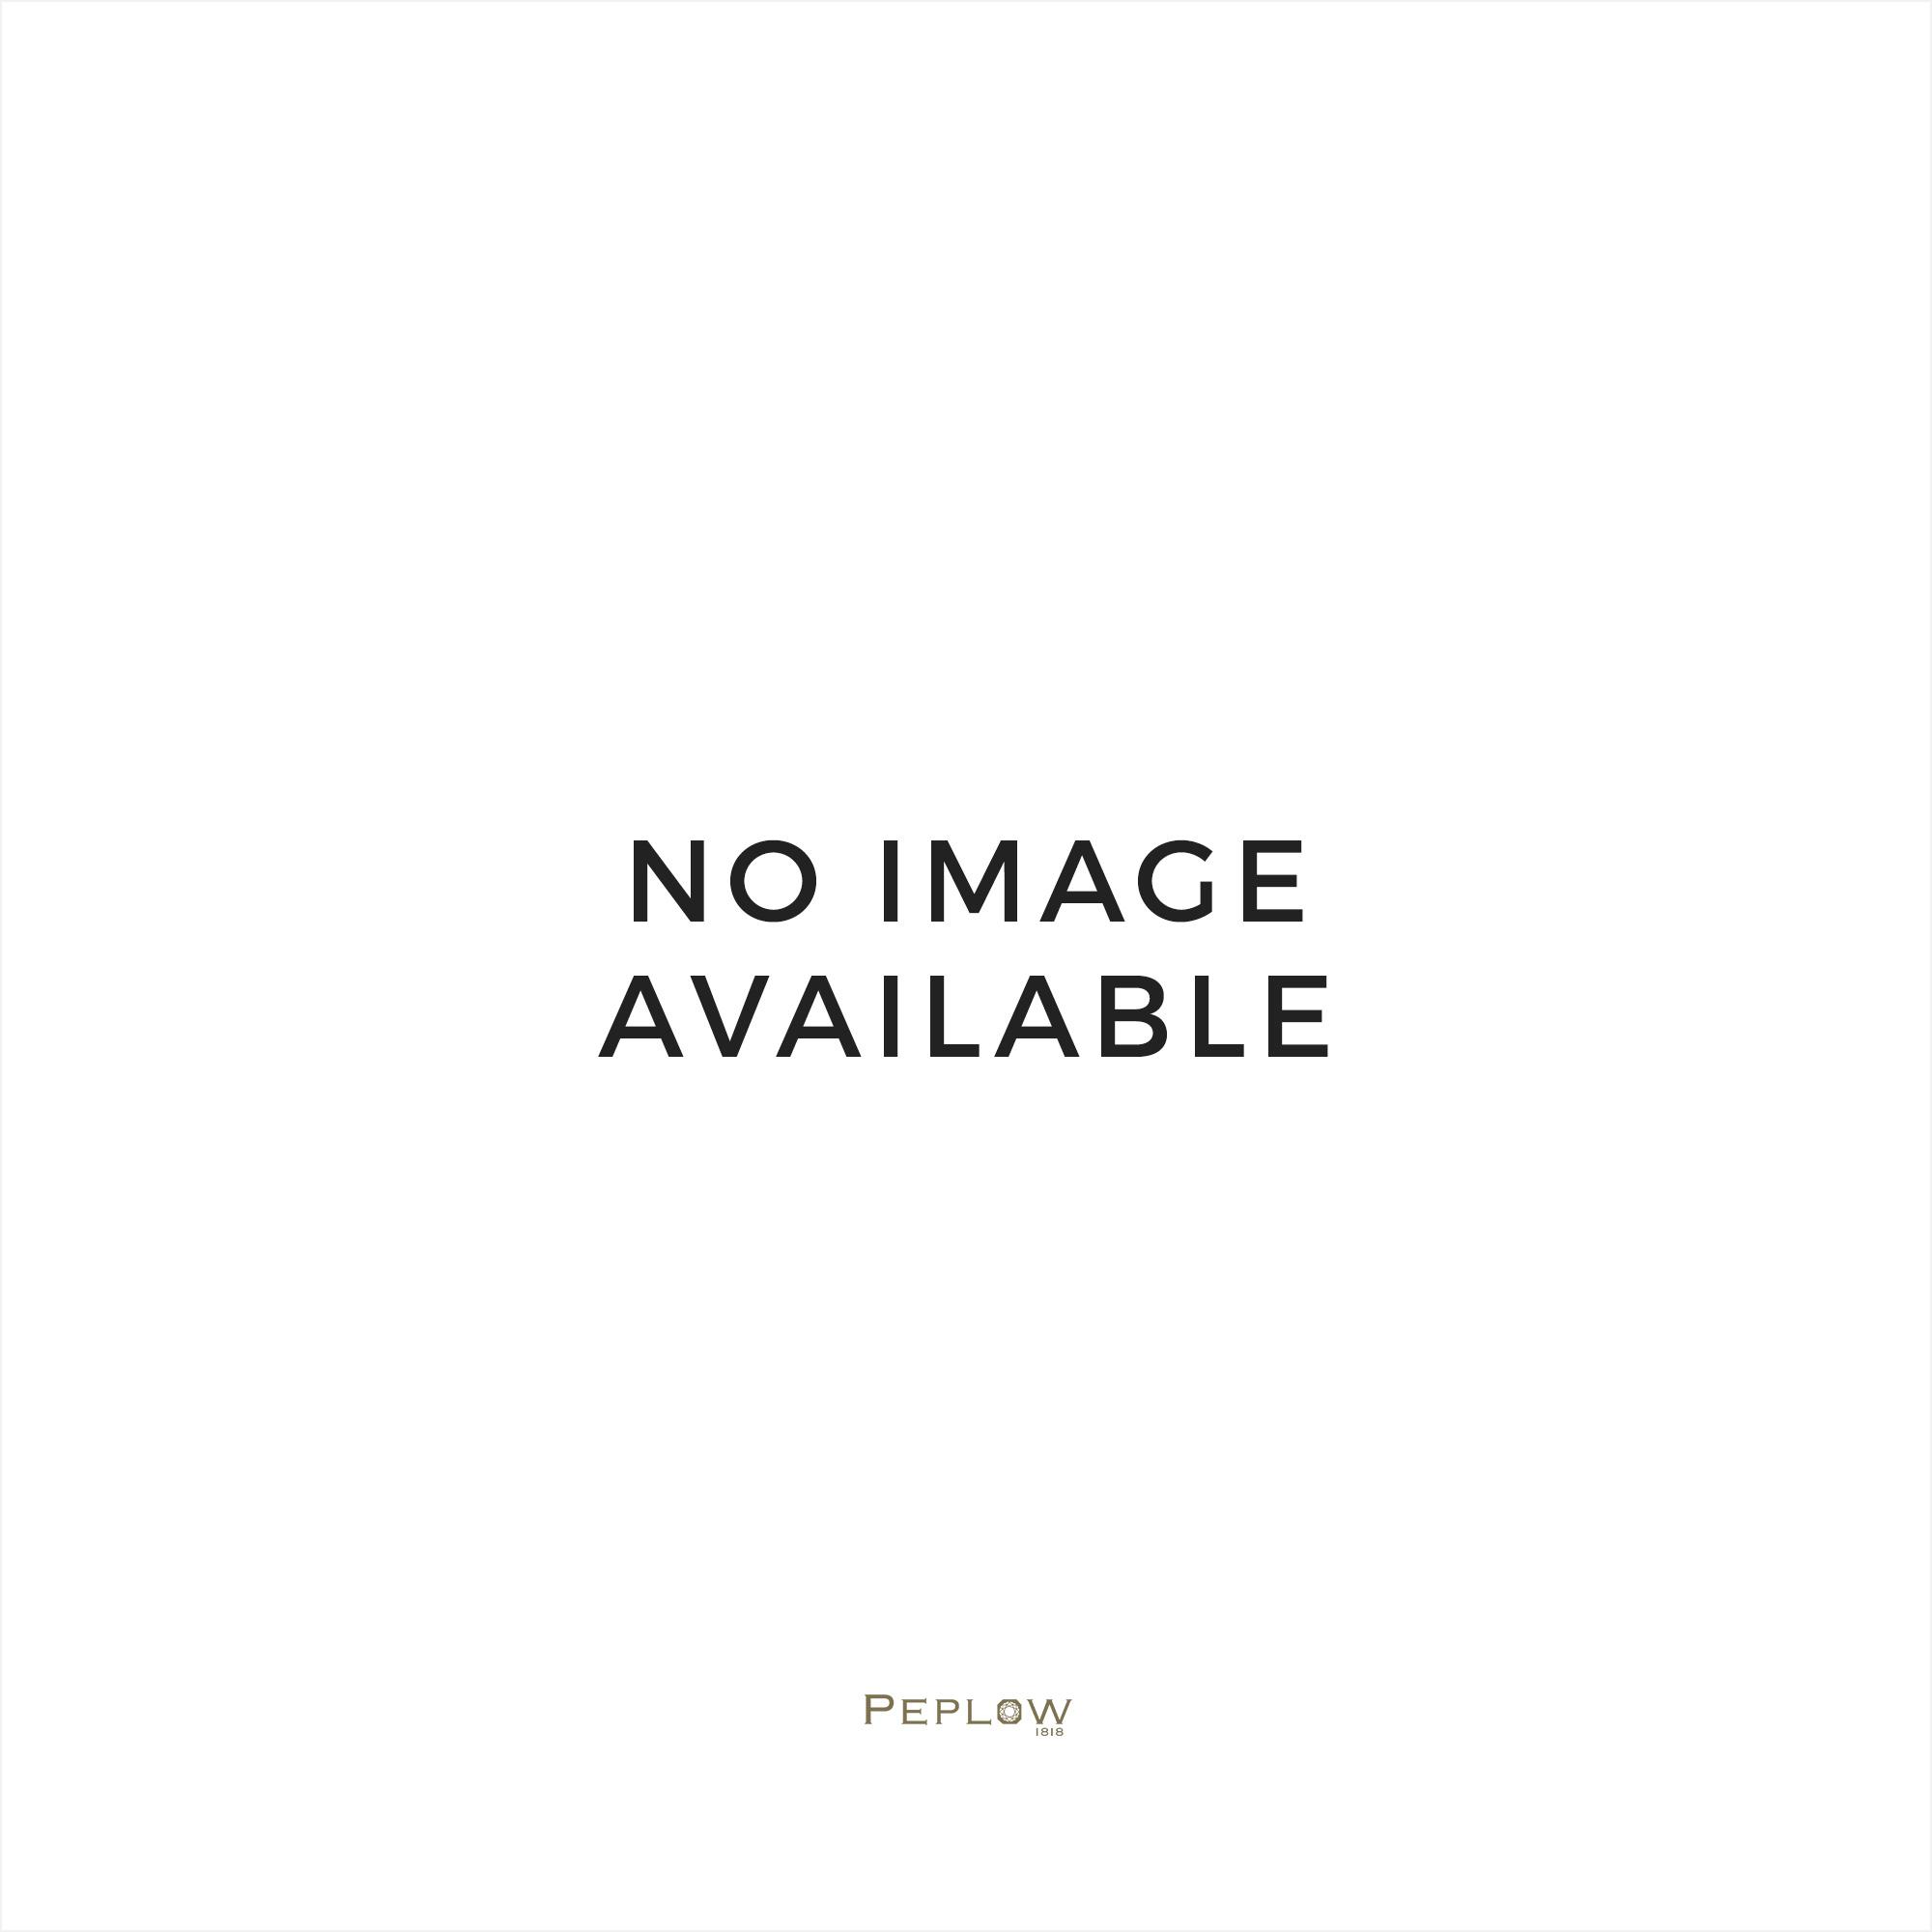 Citizen Watches mens stainless steel quartz watch bracelet